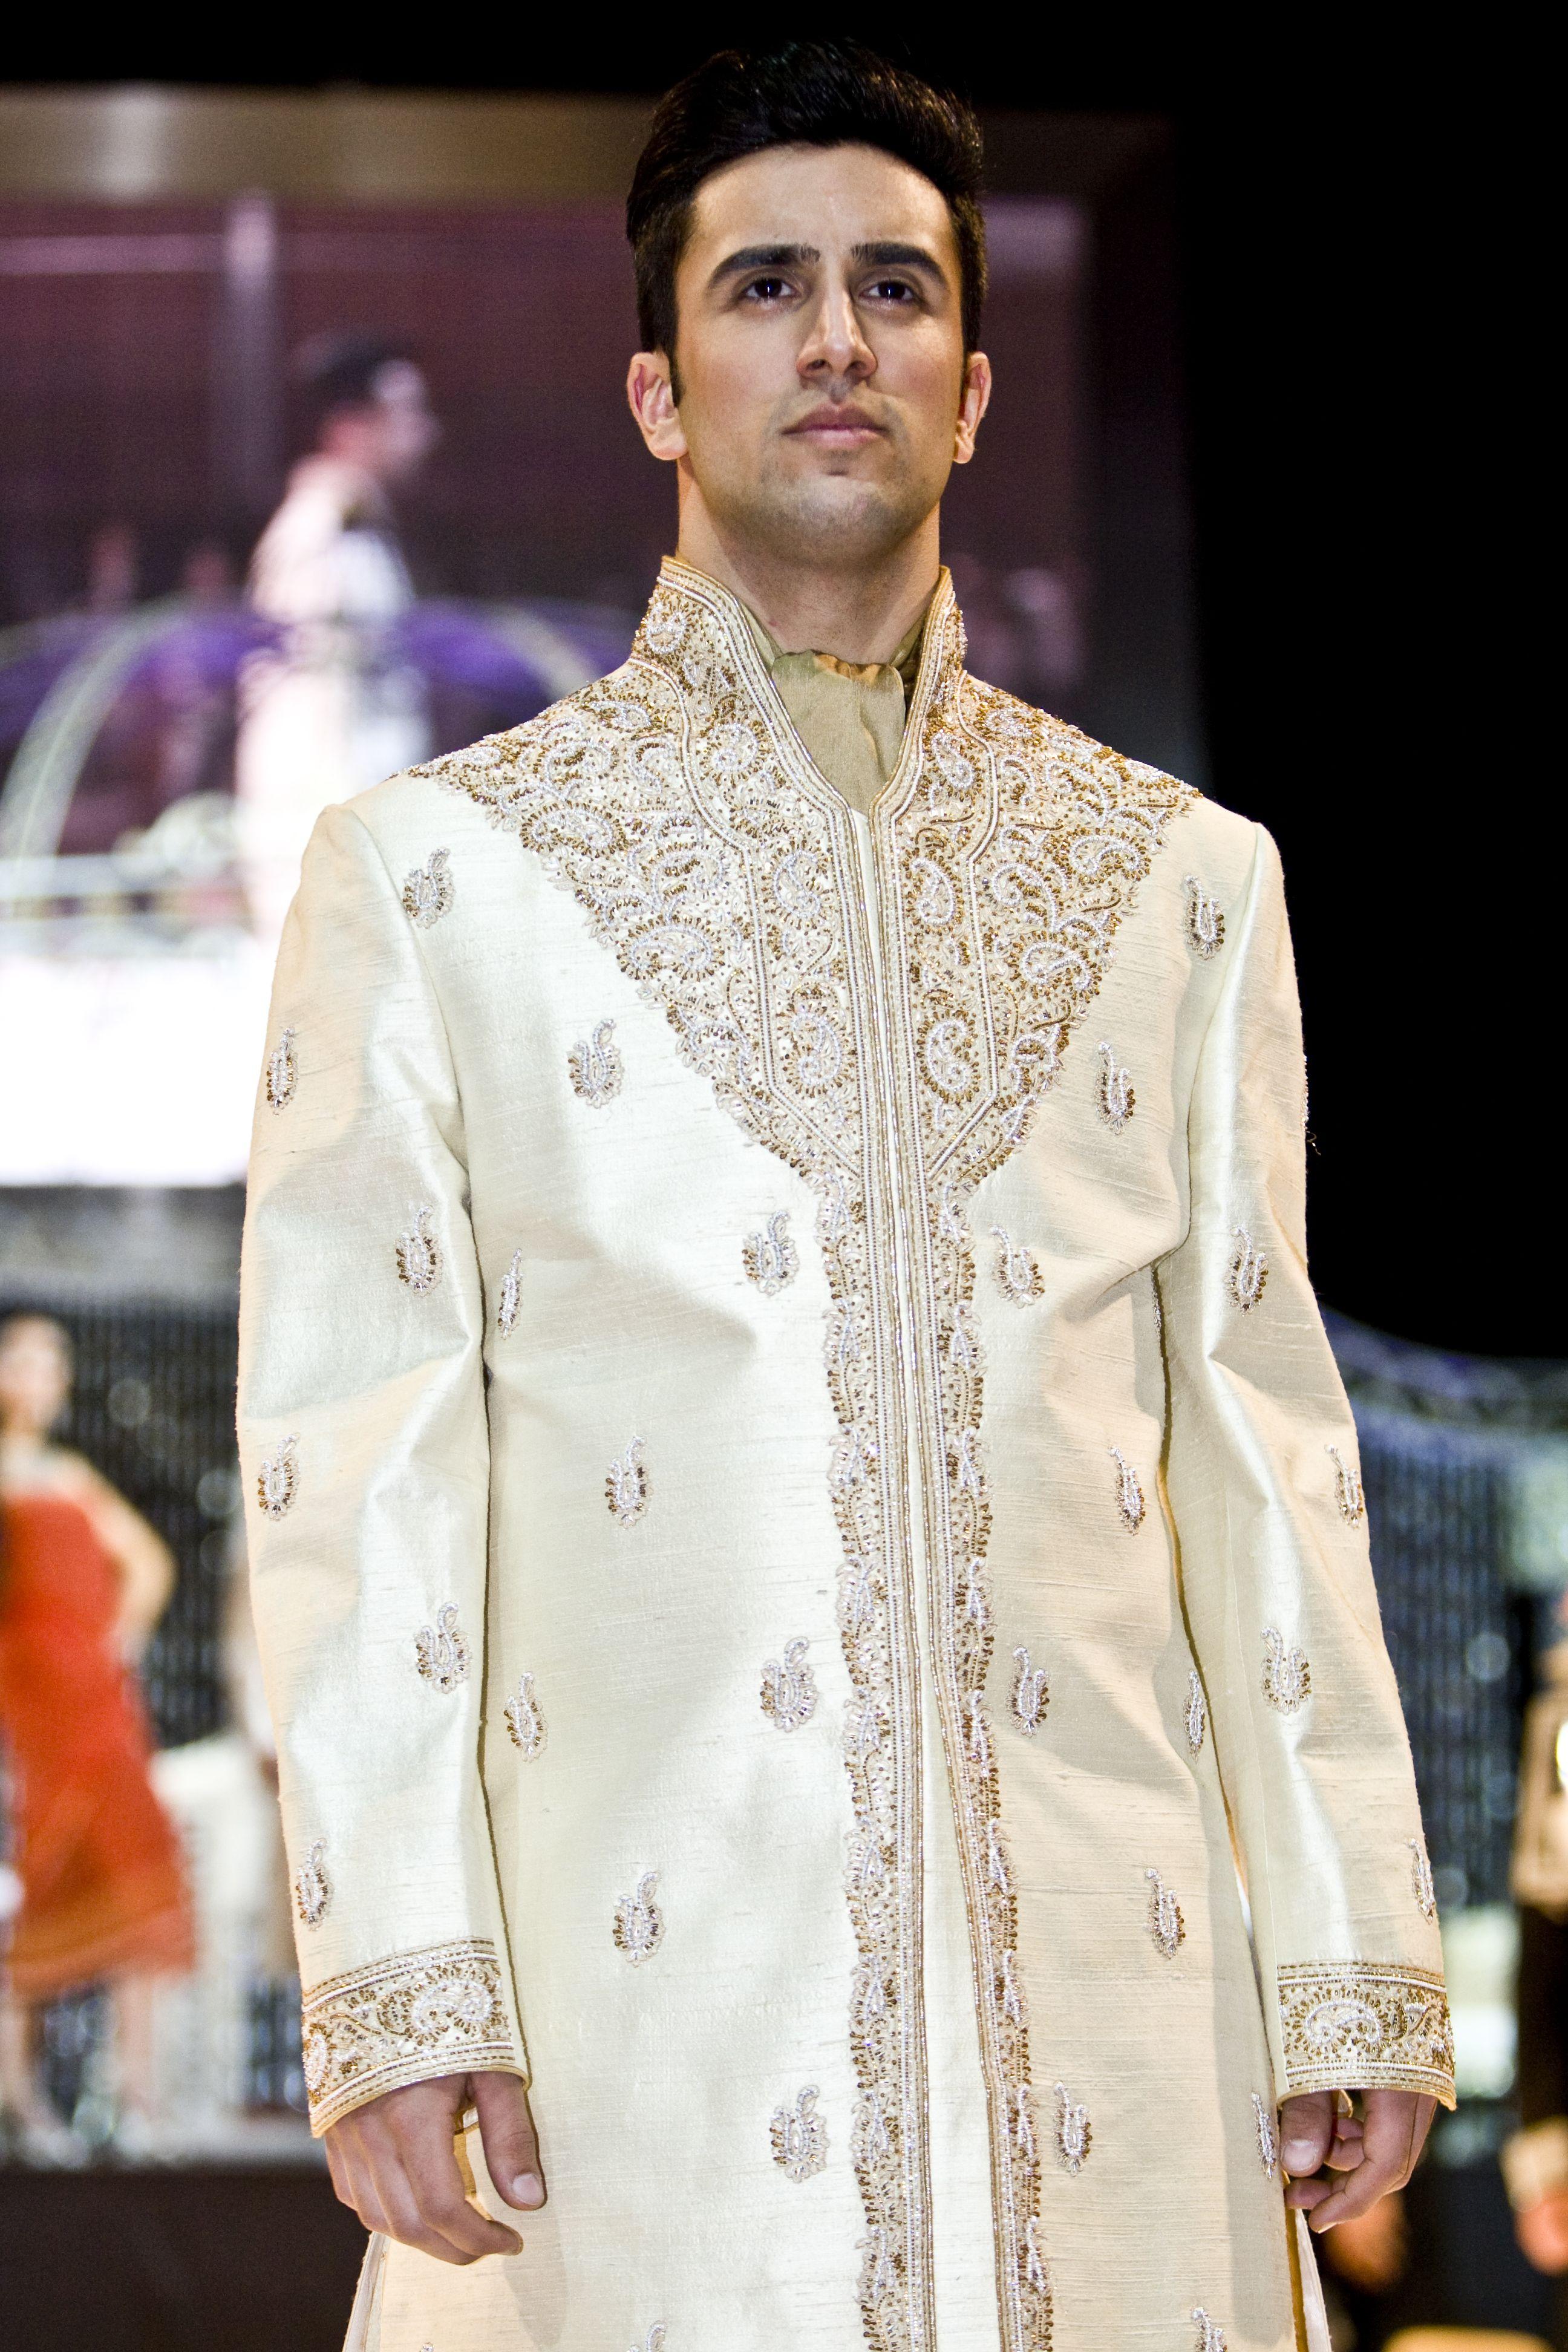 Sherwani sherwanis groom groomswear asianweddingsuits asian